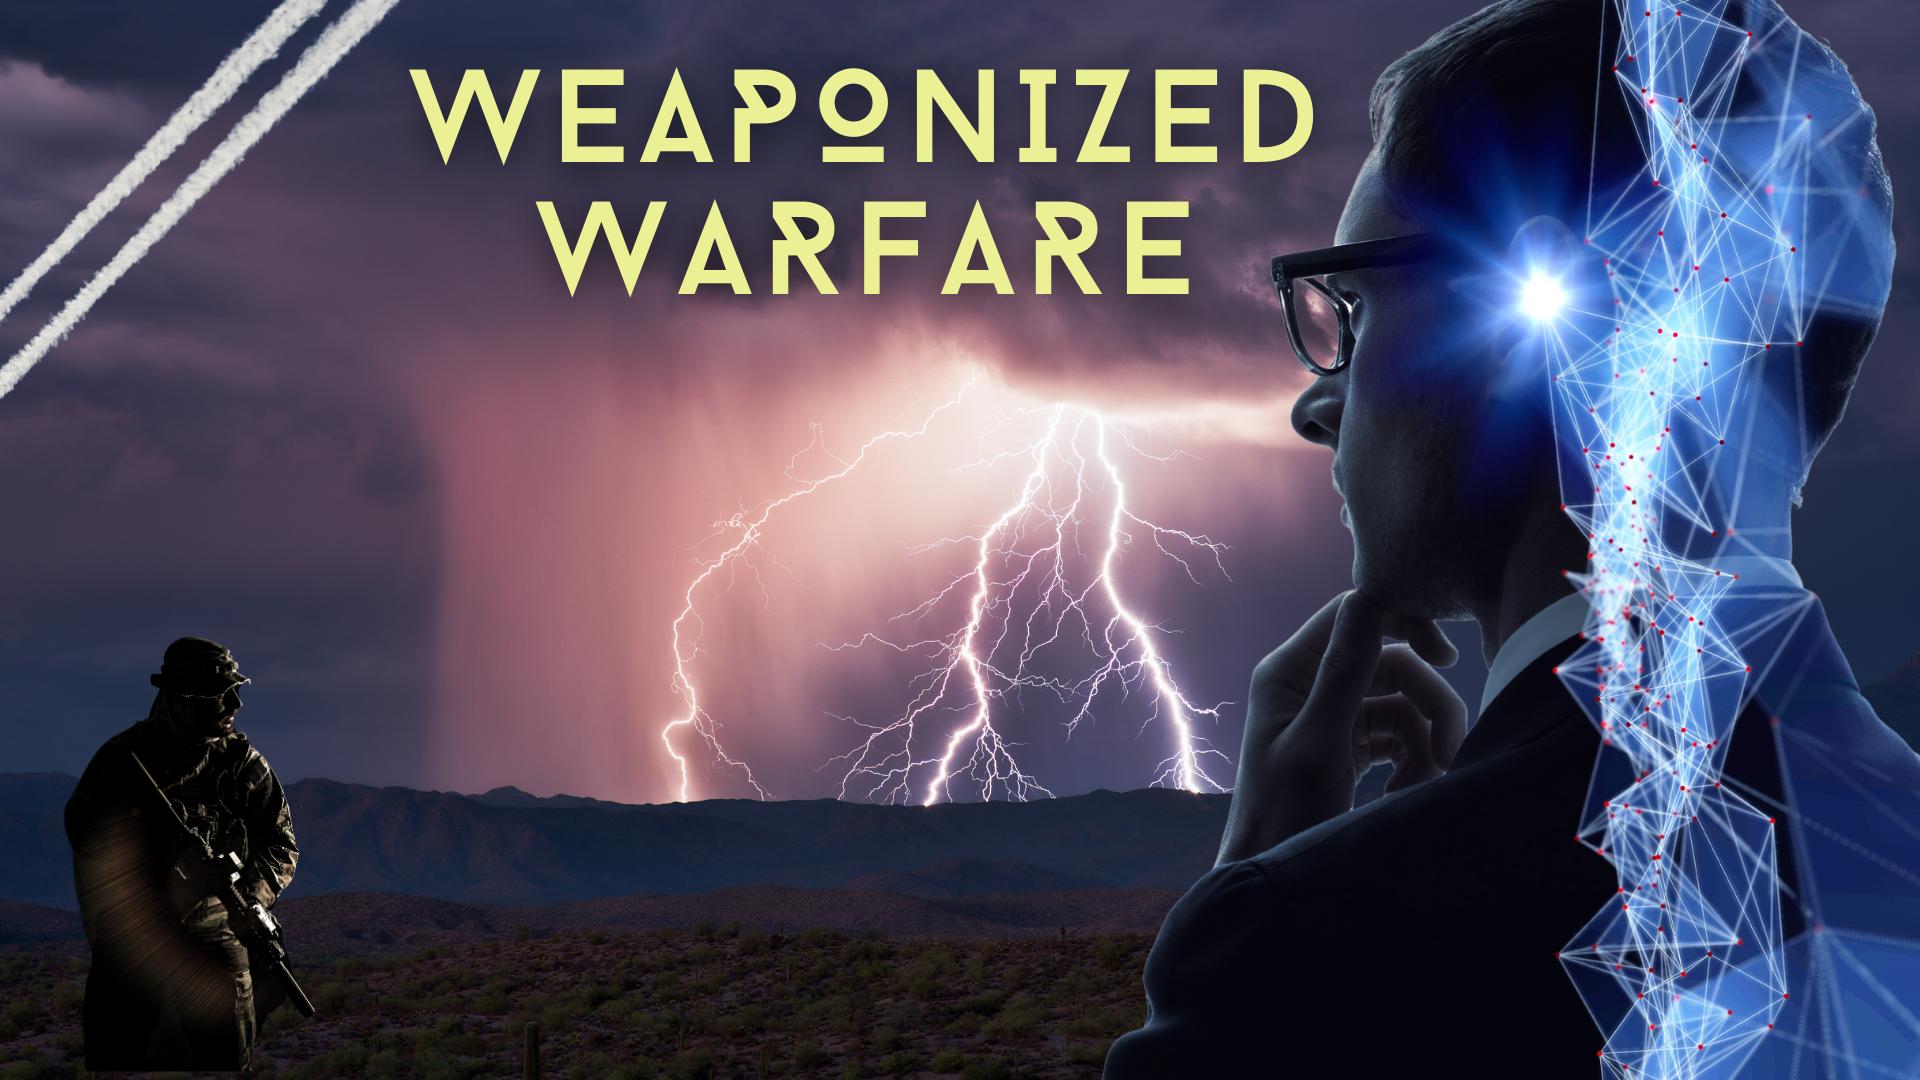 Thumbnail for Ep. #431: Weaponized Warfare w/ Elana Freeland